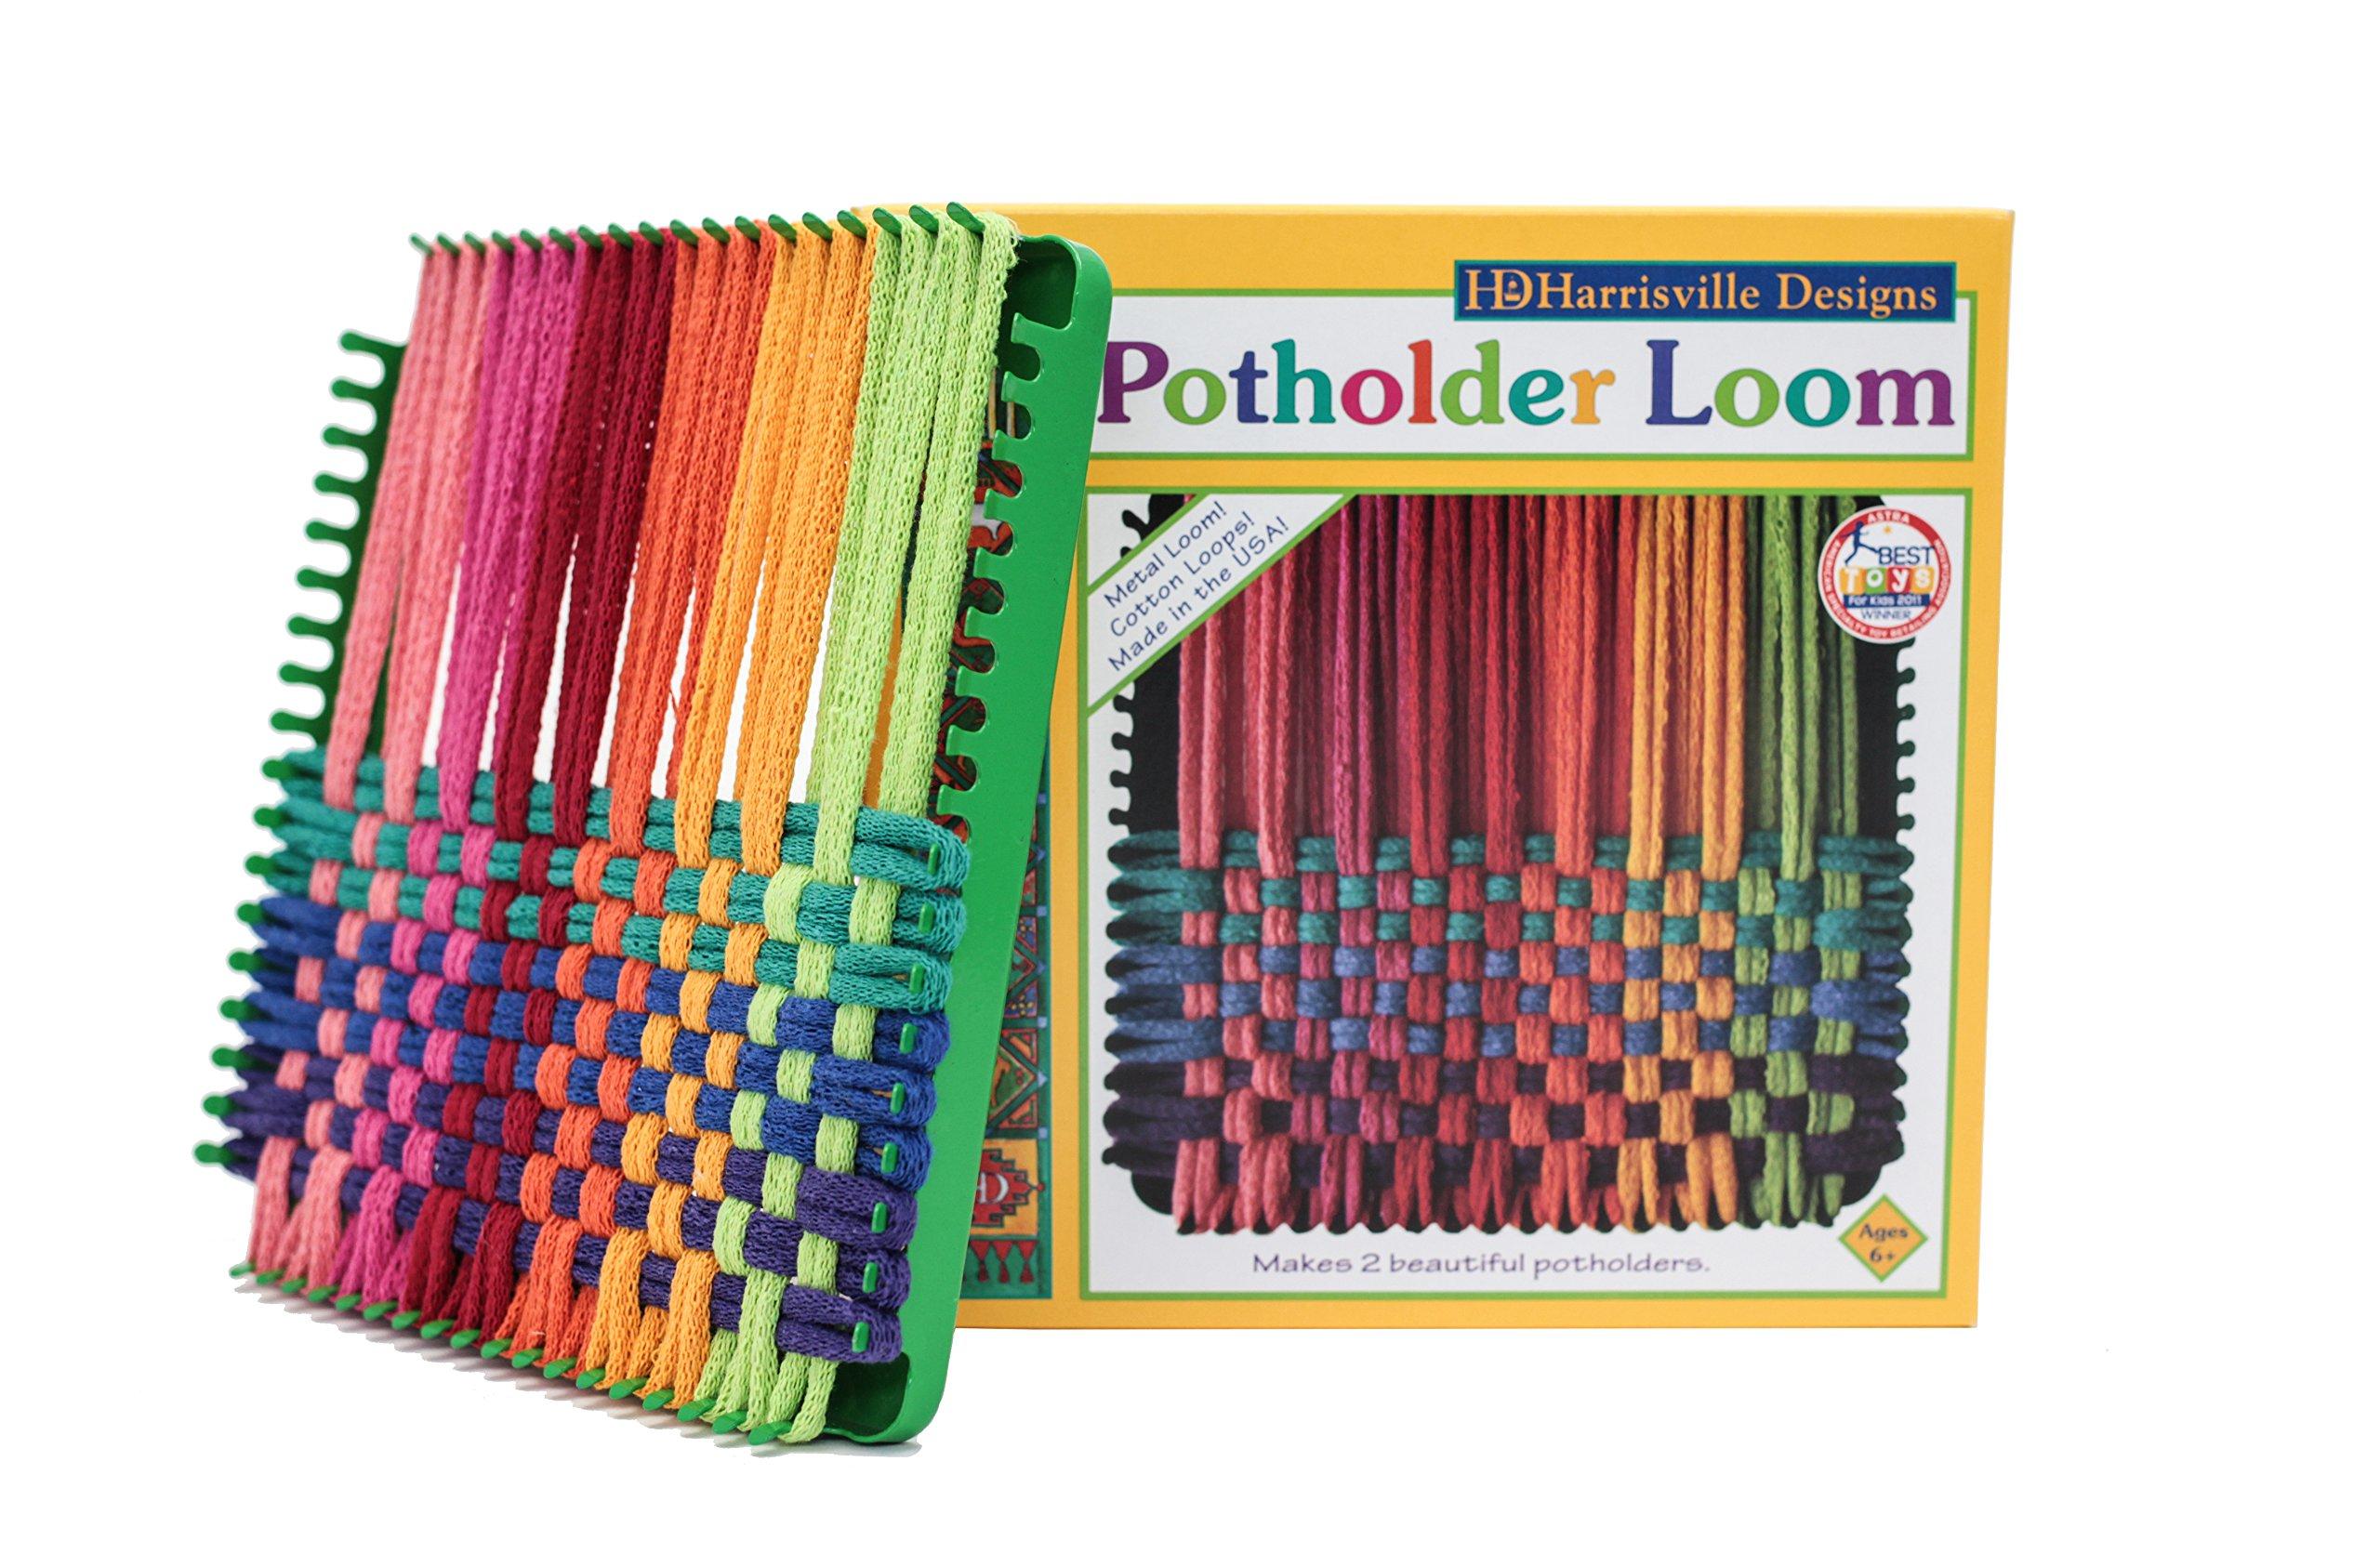 Harrisville Designs Traditional 7'' Potholder Loom Kit, Makes 2 Potholders by Harrisville Designs